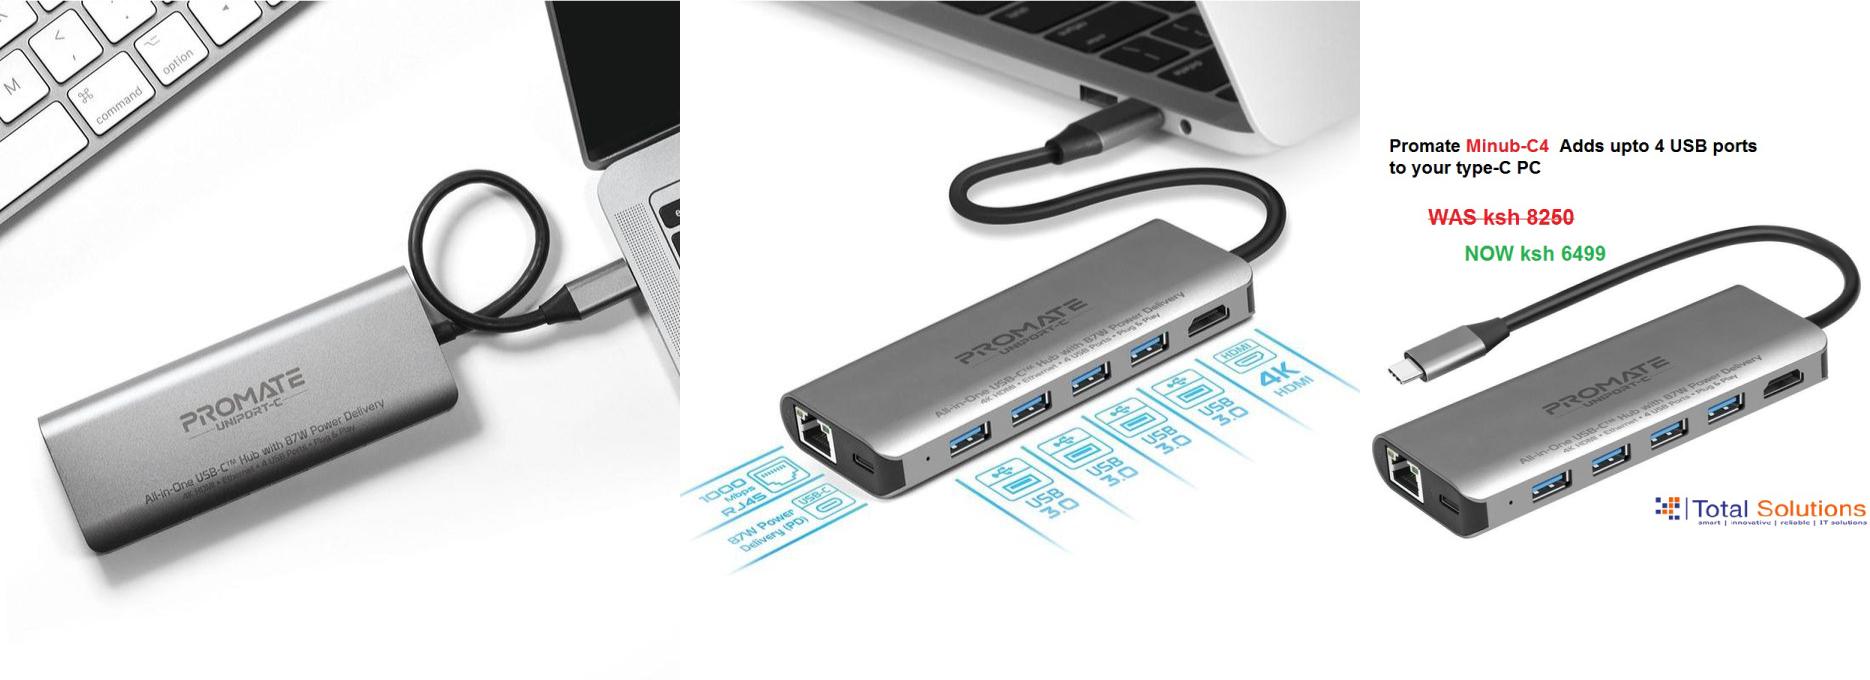 Promate USB-C Charging Hub W/ HDMI & Ethernet Port